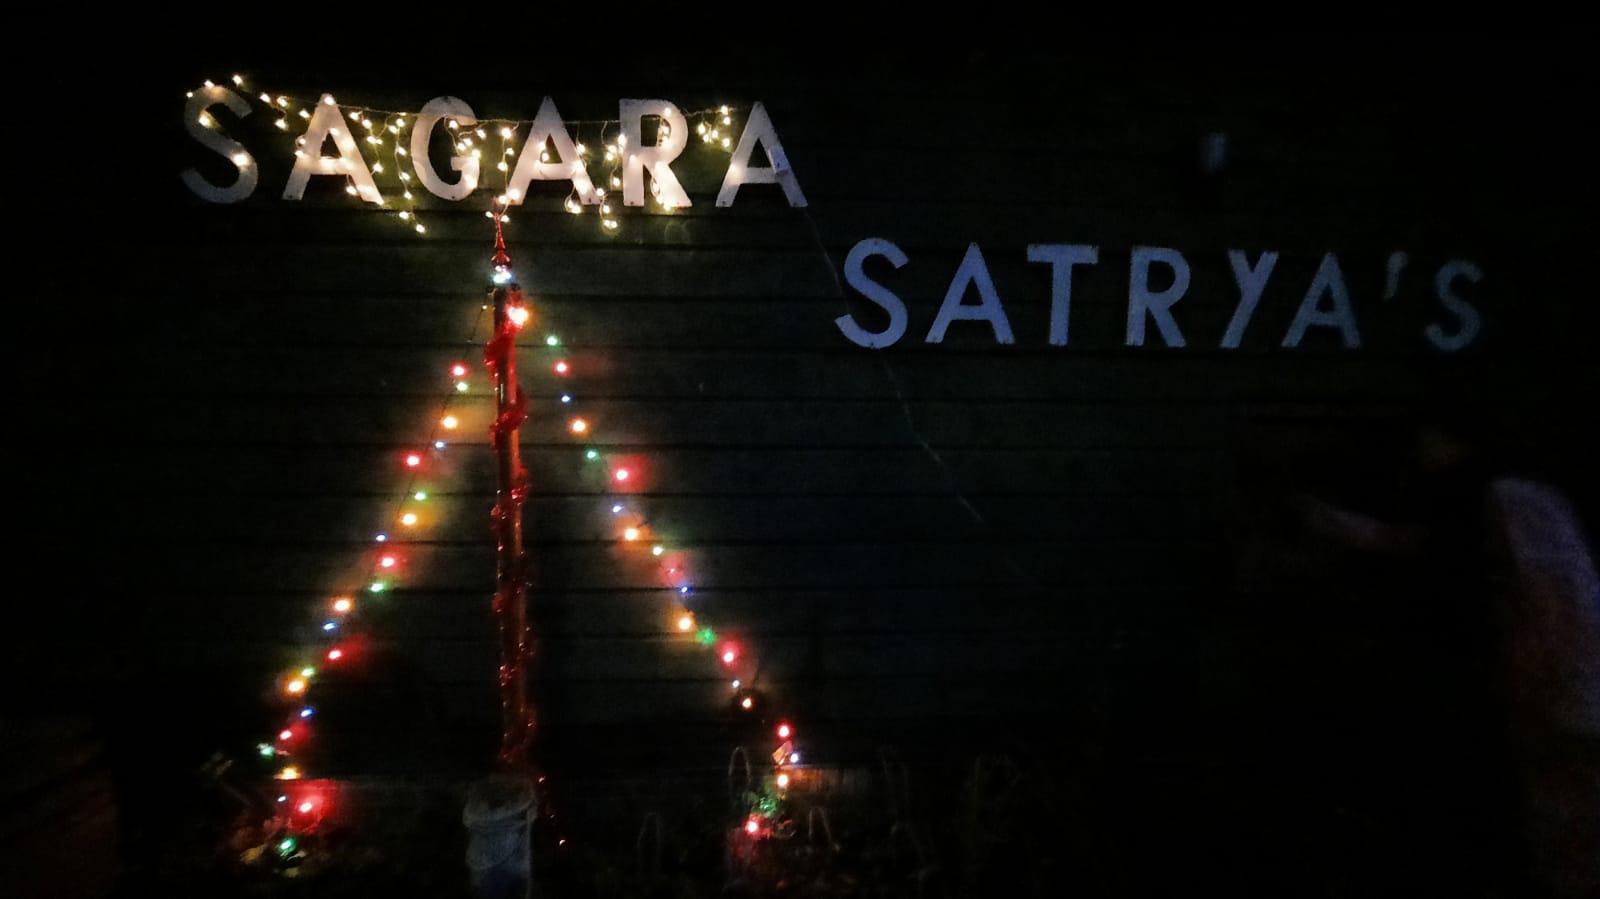 SAGARA'S 75 JAAR